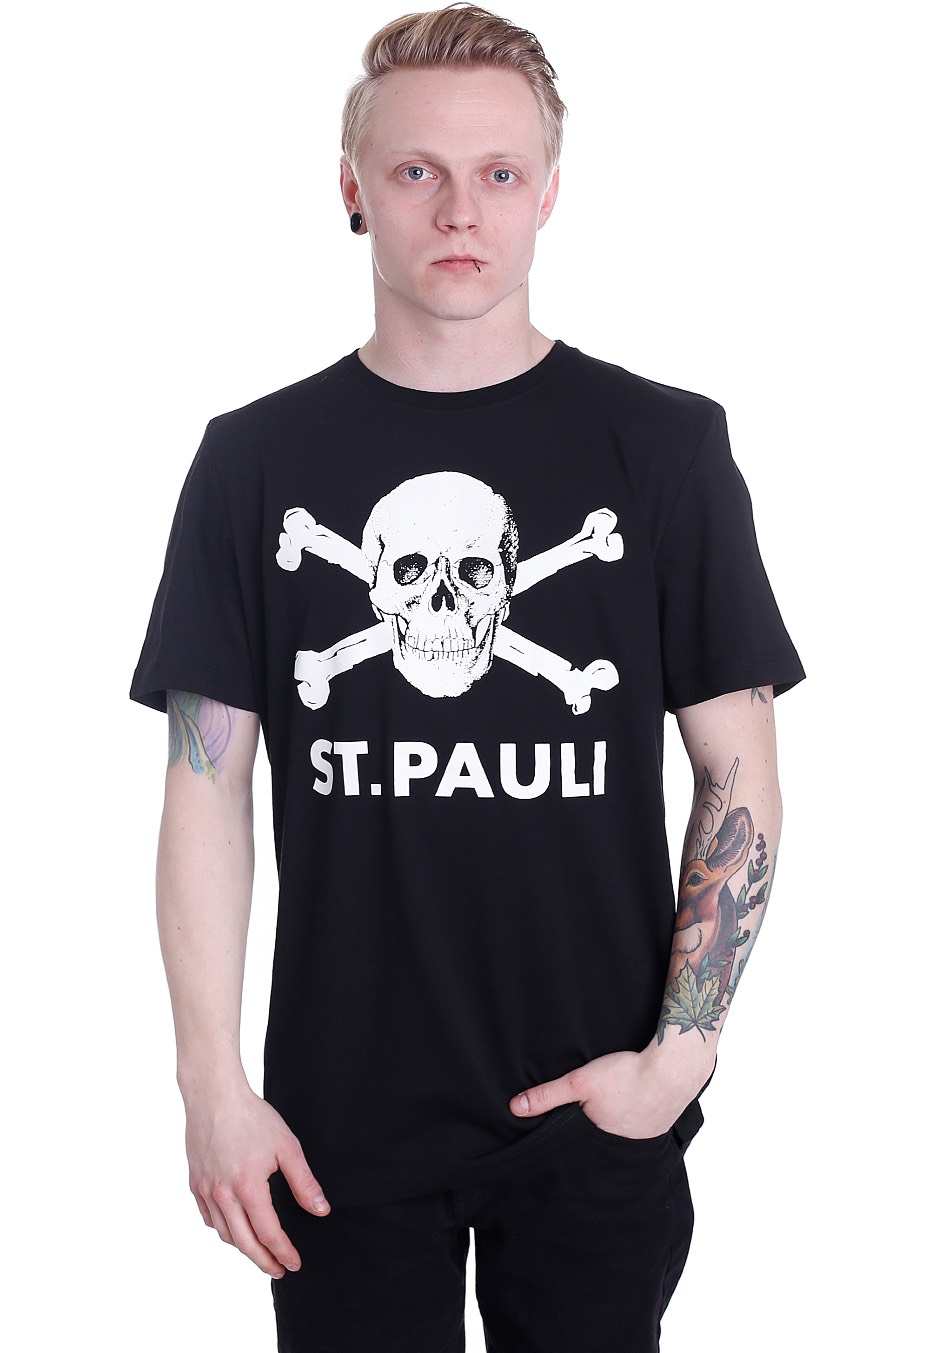 fc st pauli totenkopf i t shirt official merchandise shop uk. Black Bedroom Furniture Sets. Home Design Ideas